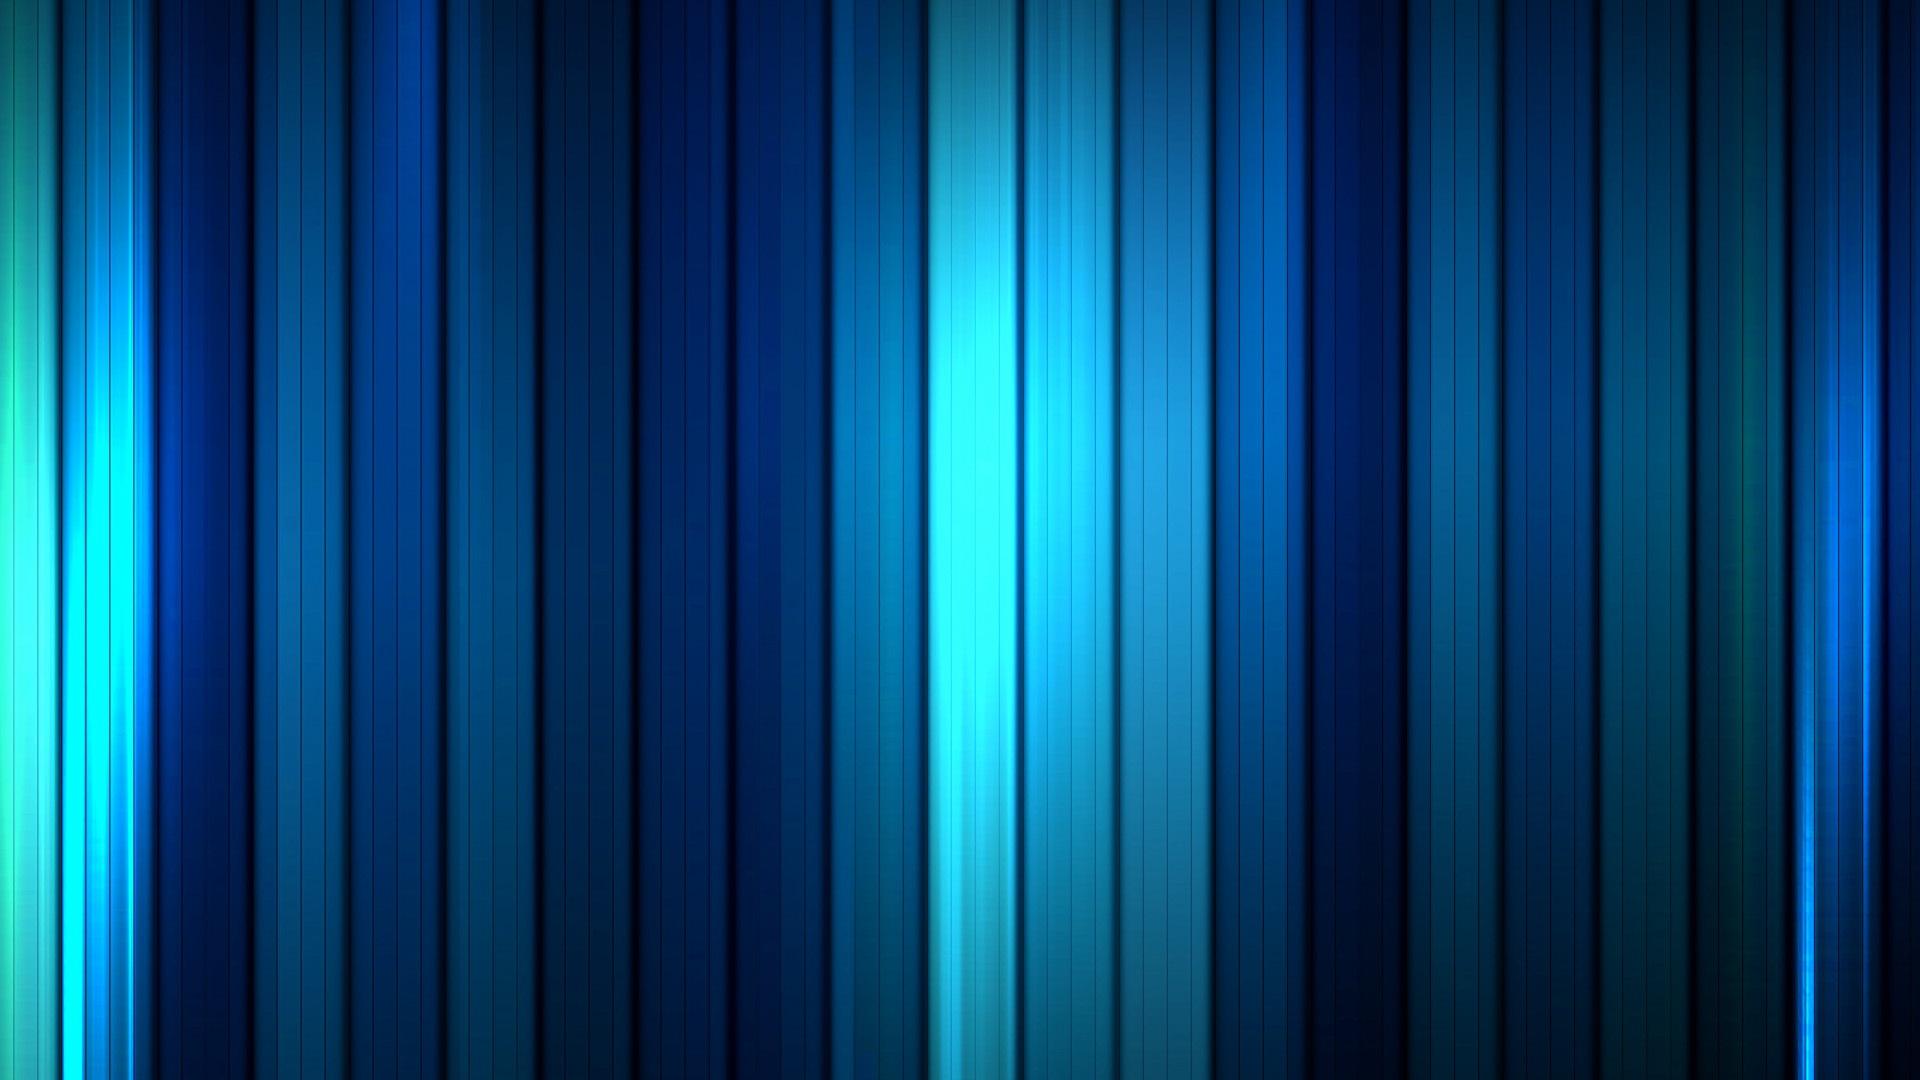 Navy blue hd wallpaper wallpapersafari for Navy blue wallpaper for walls